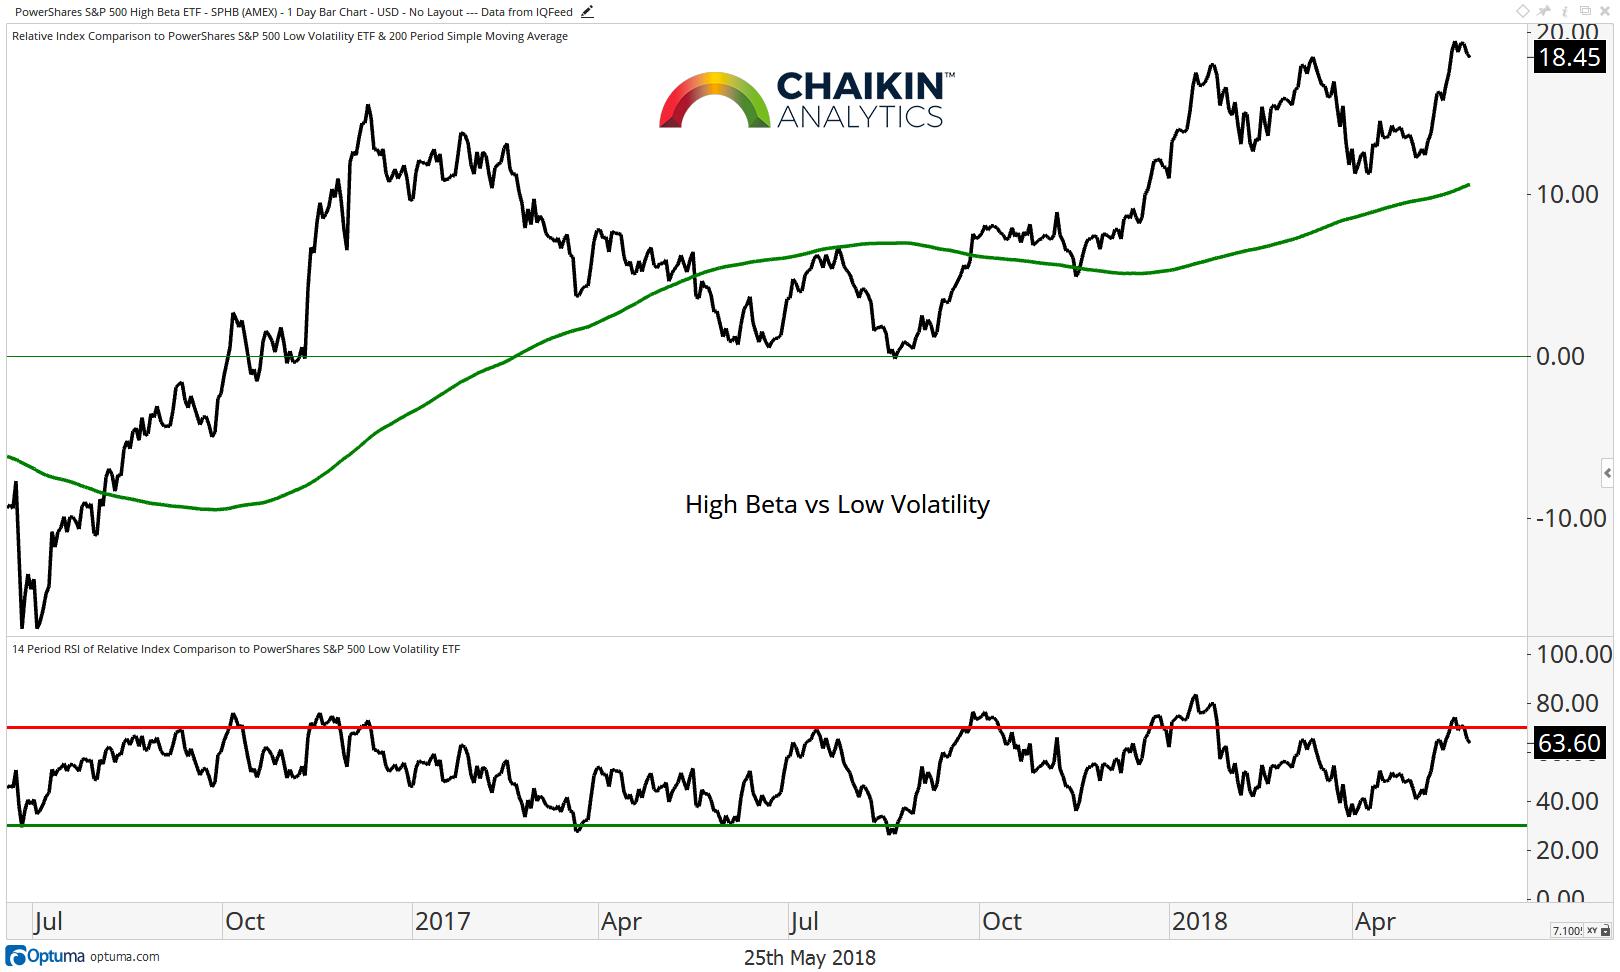 high beta vs low volatililty stock market performance chart_4 june